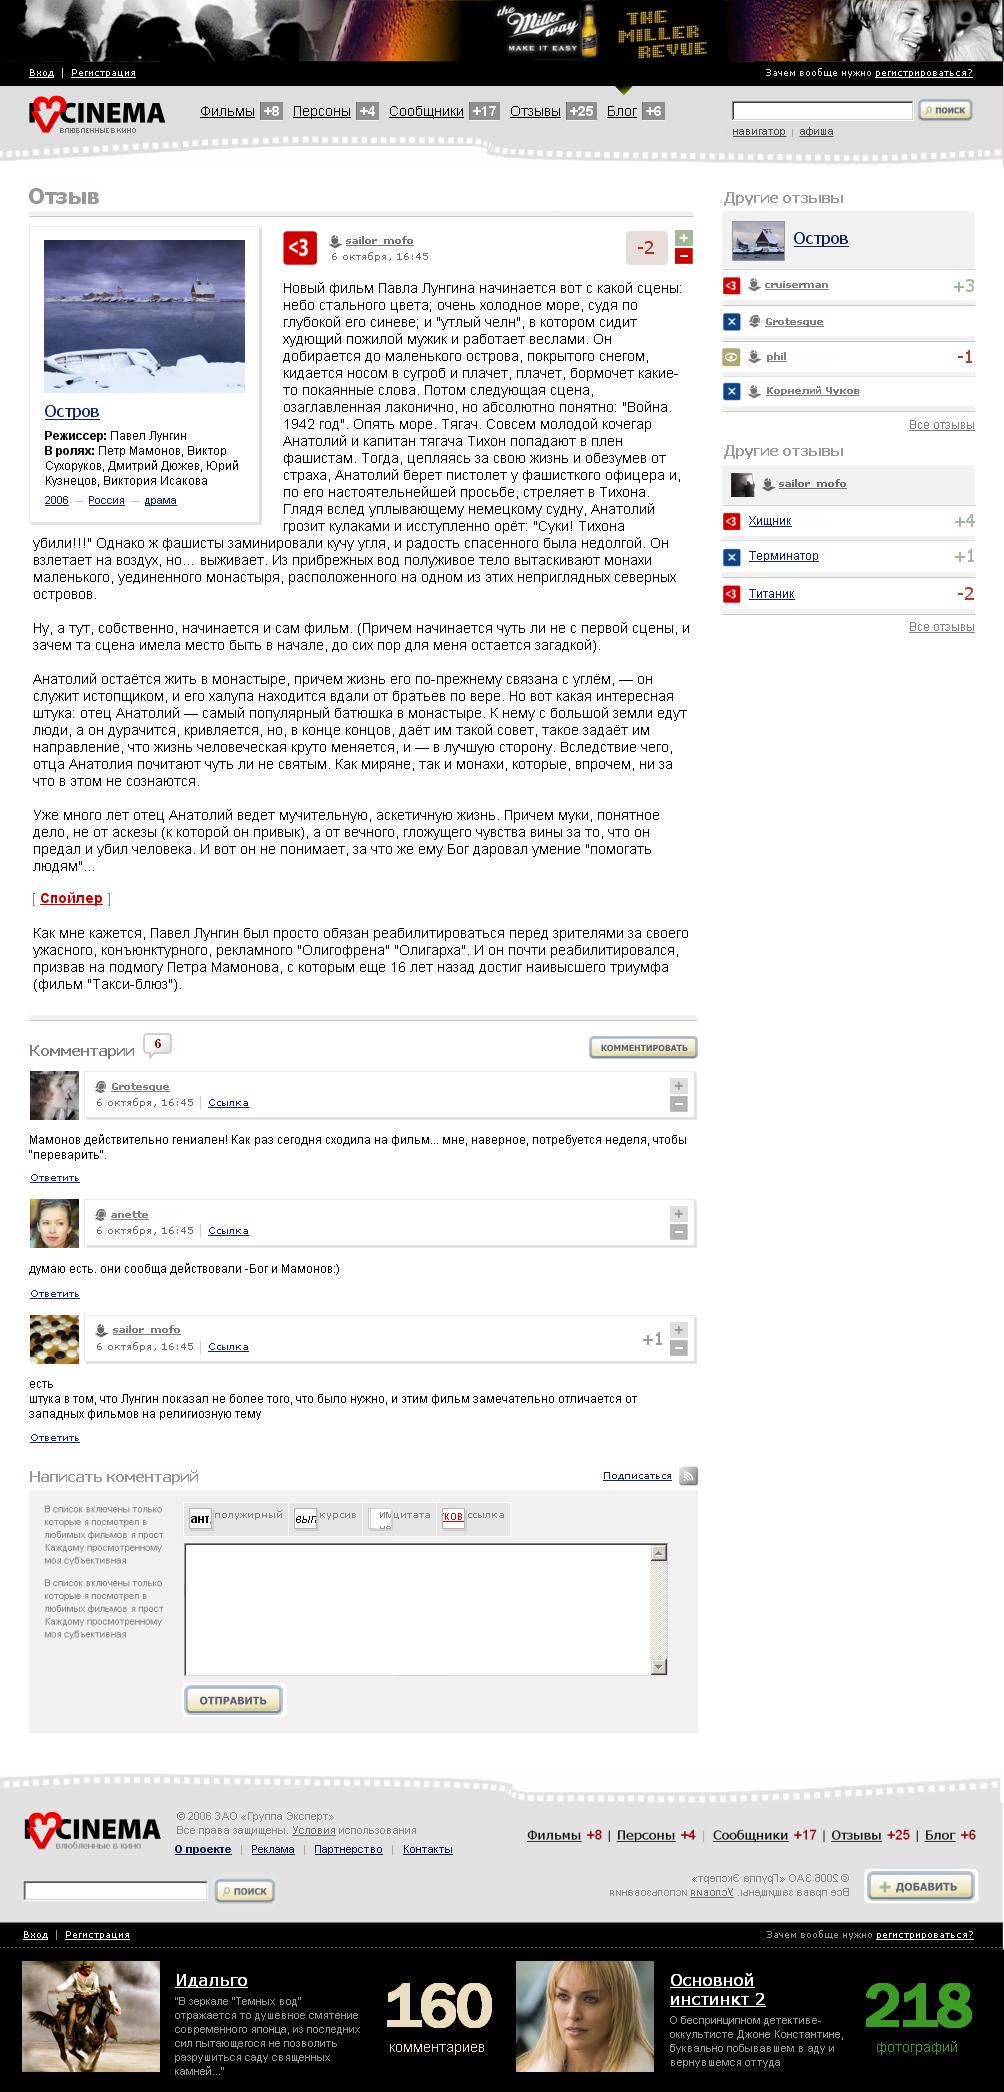 Отзывы о sexmamba.com